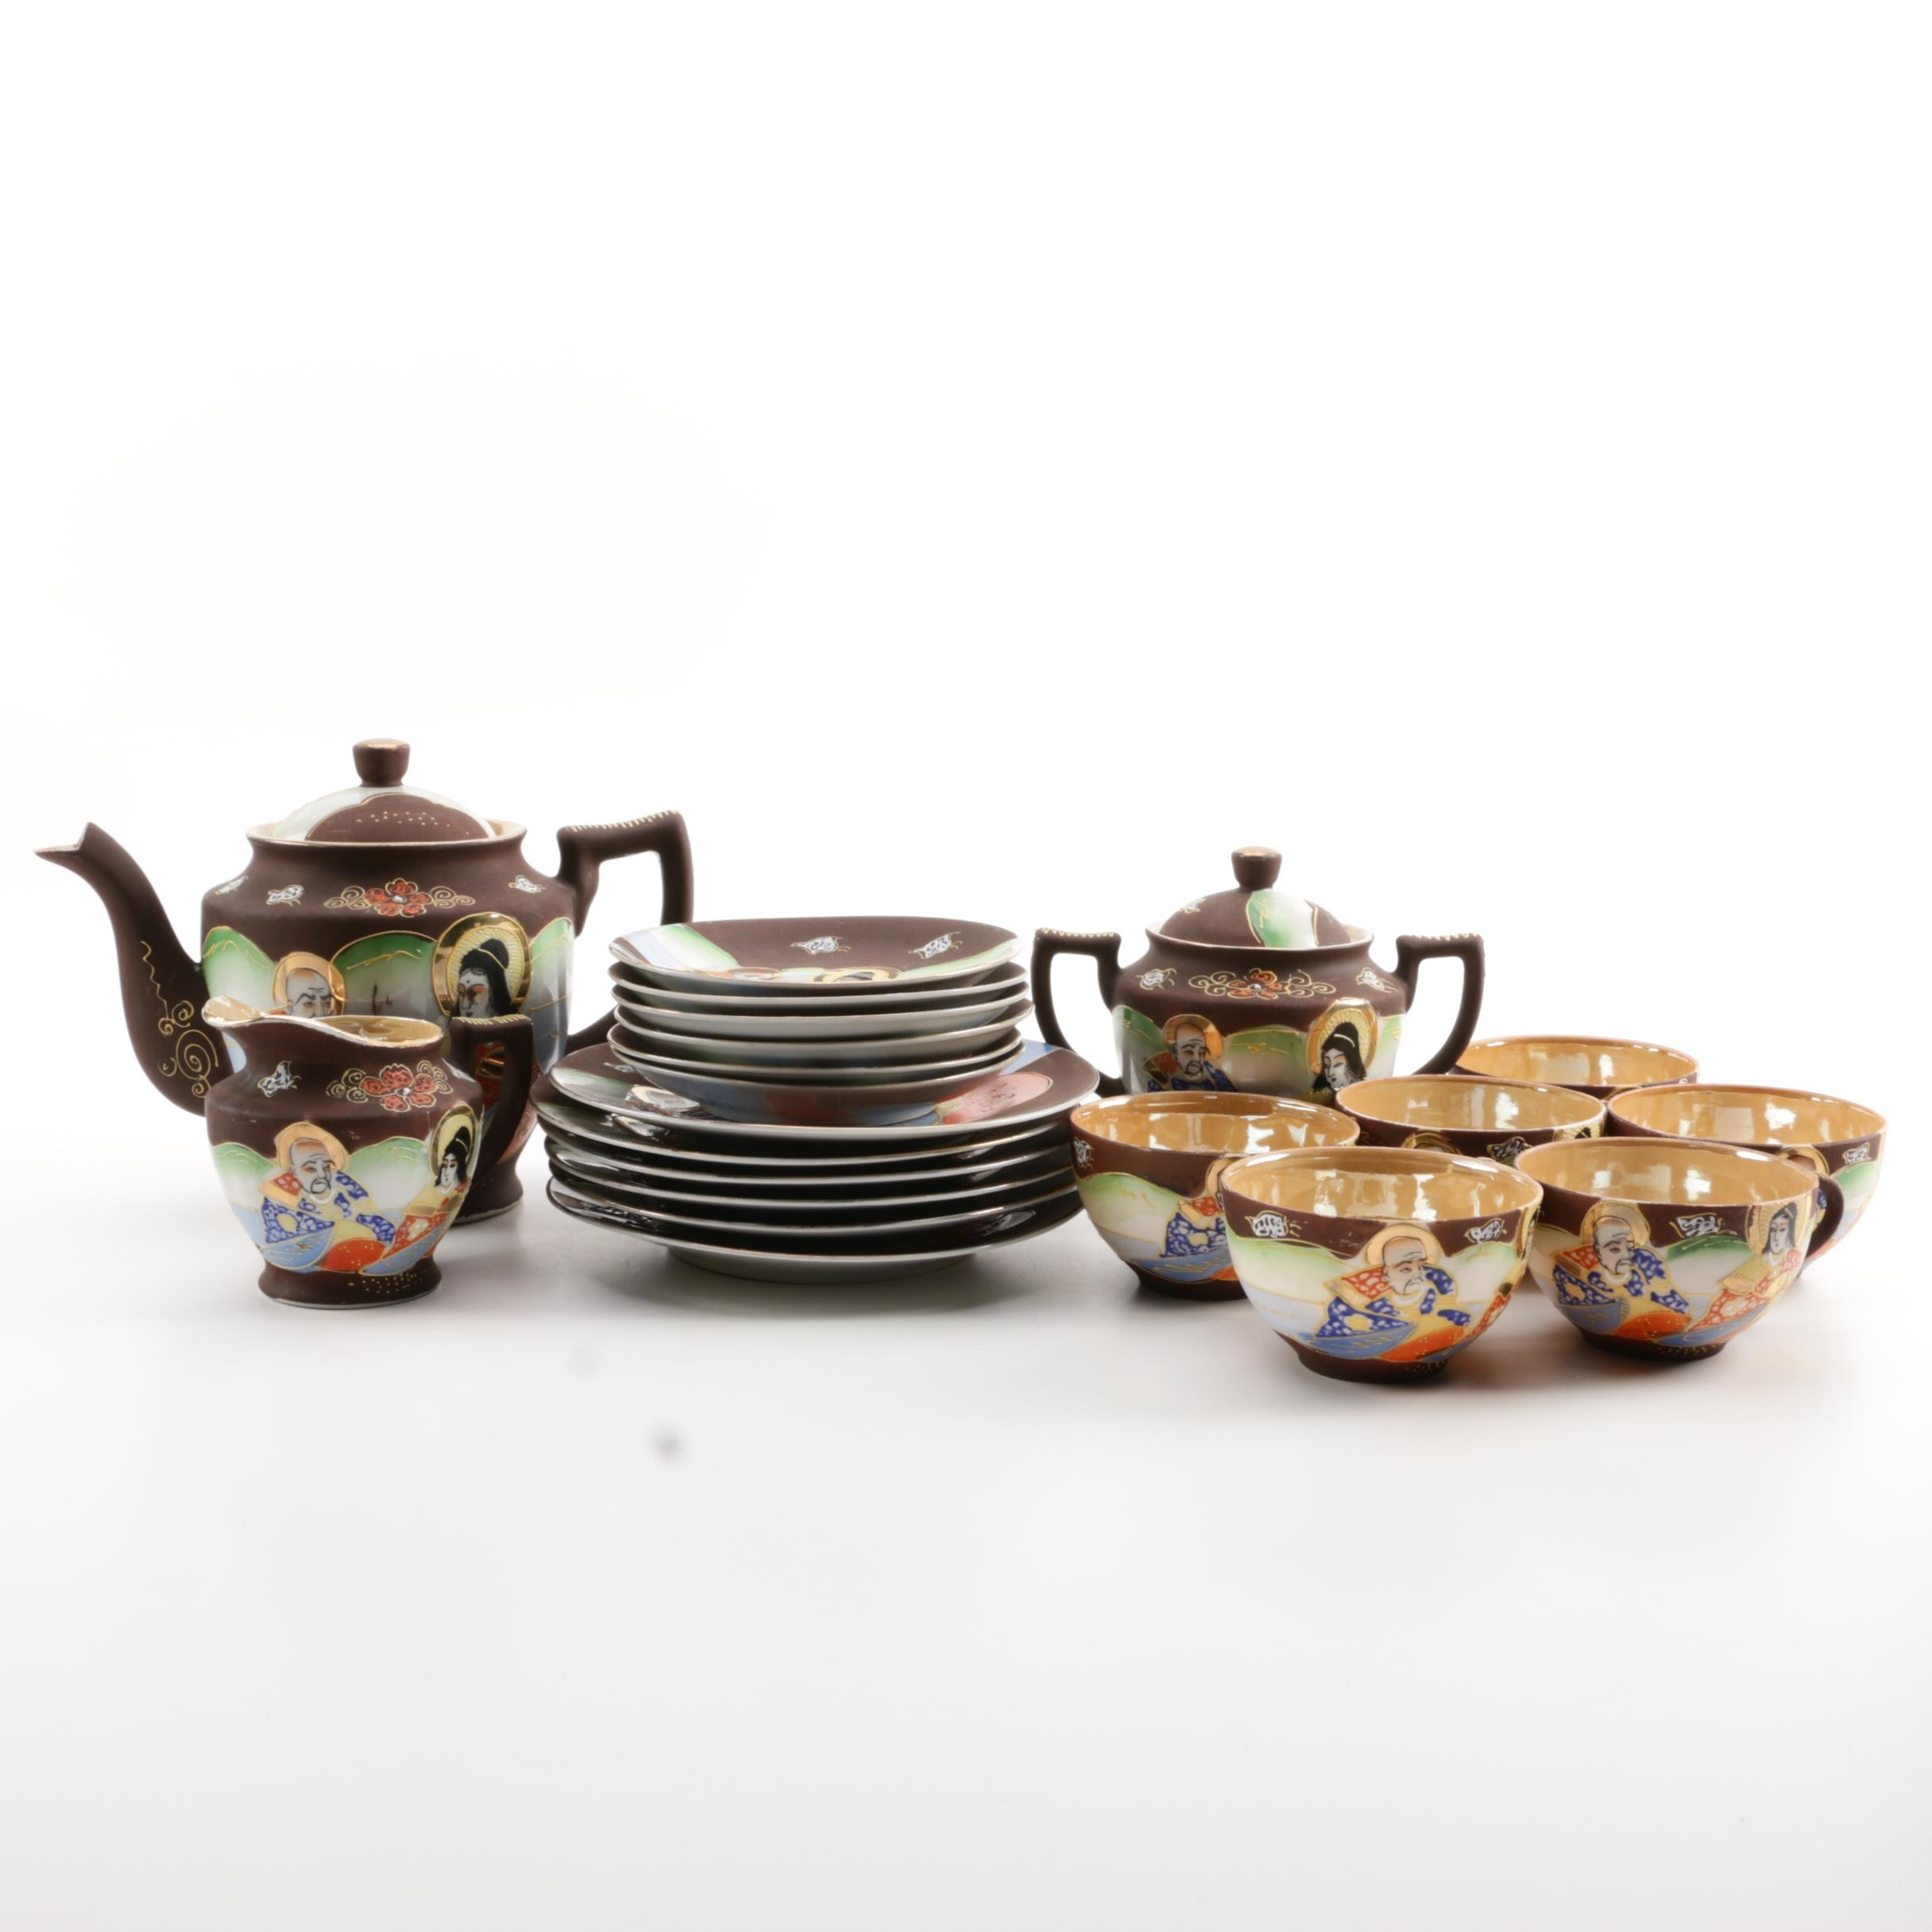 Japanese Satsuma Style Porcelain Tea Service